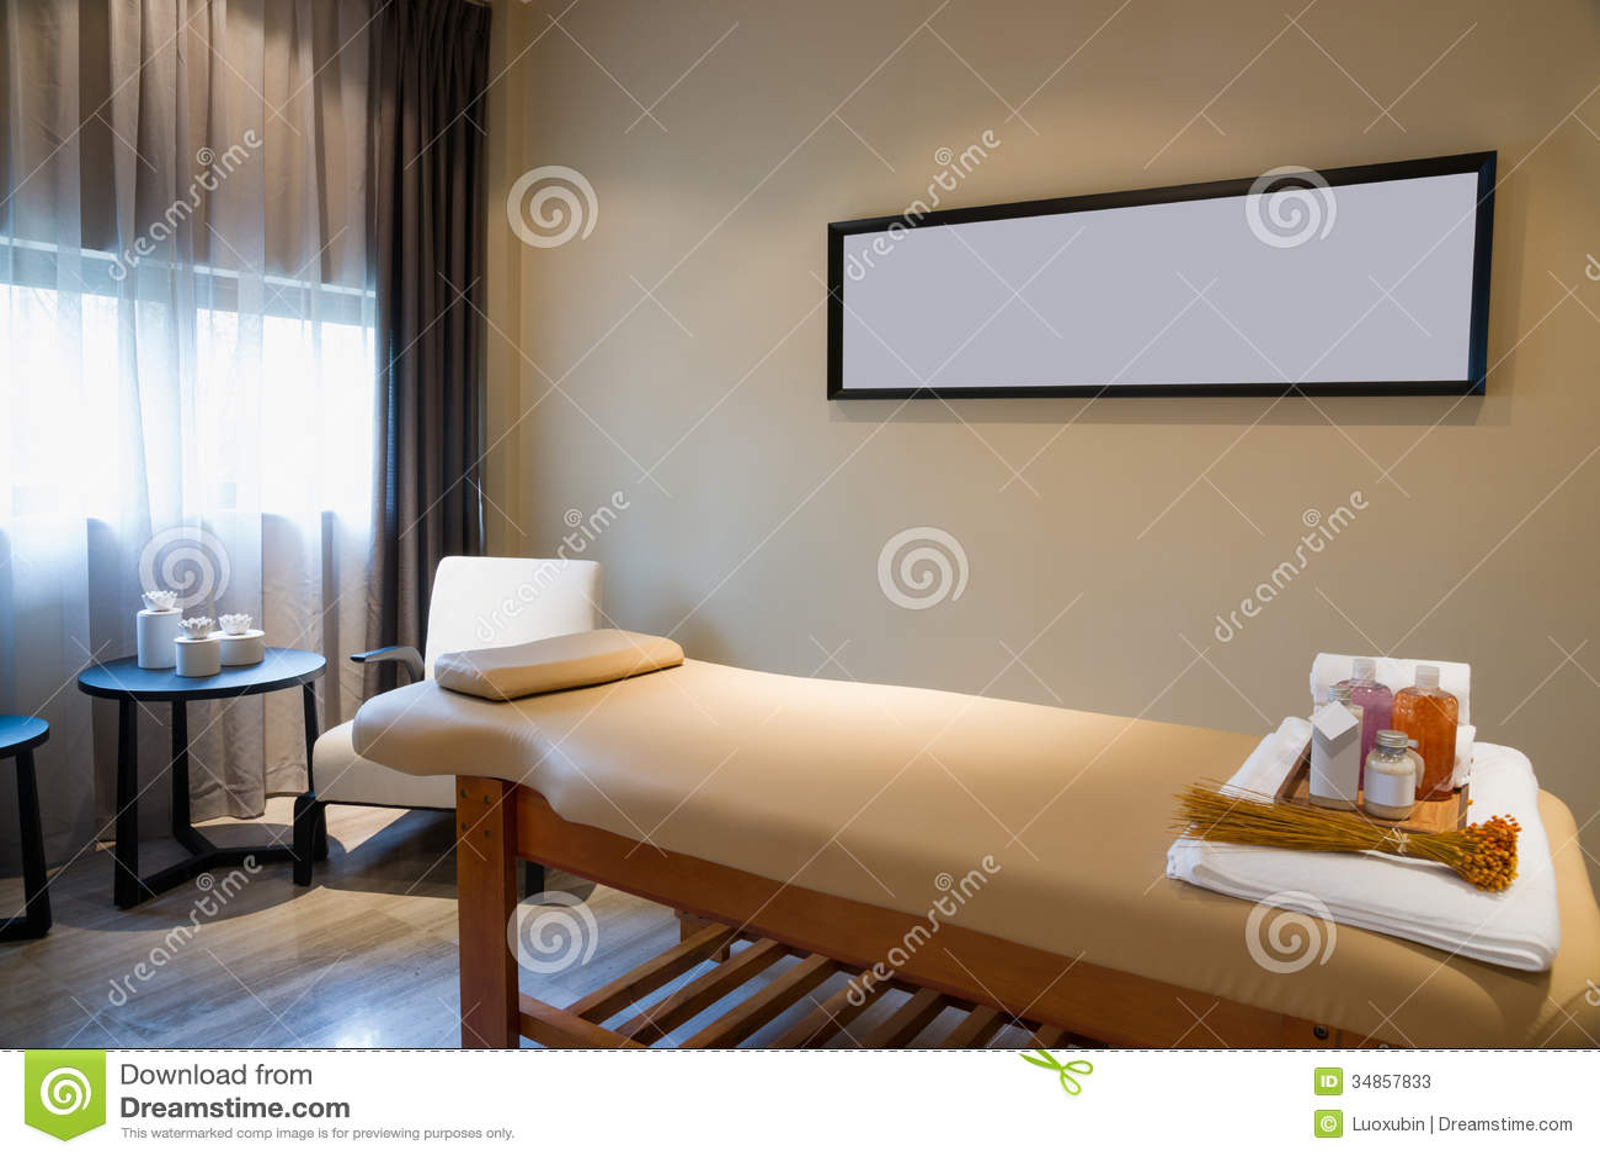 Massage Room Stock Photos Image 34857833